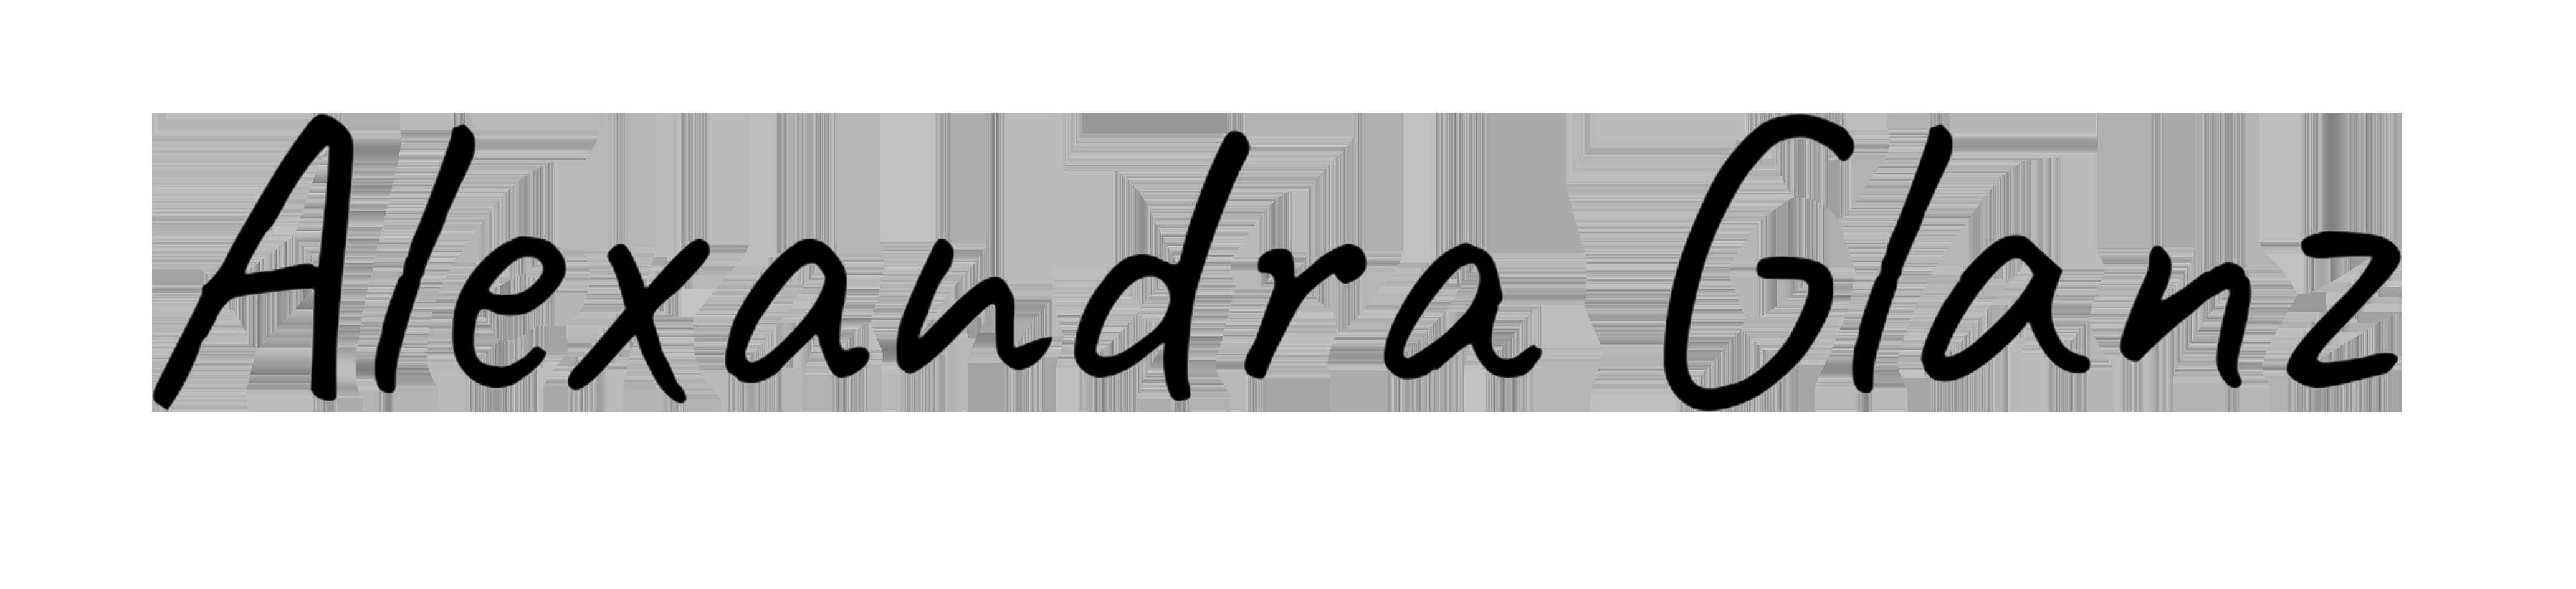 android,application mobile,chartegraphique,Design,ecommerce,ios,logo, agence web, agence mobile, agence digitale, société création de site web, agence application mobile, agence influencer, agence UX,agence UI,Likeweb agency